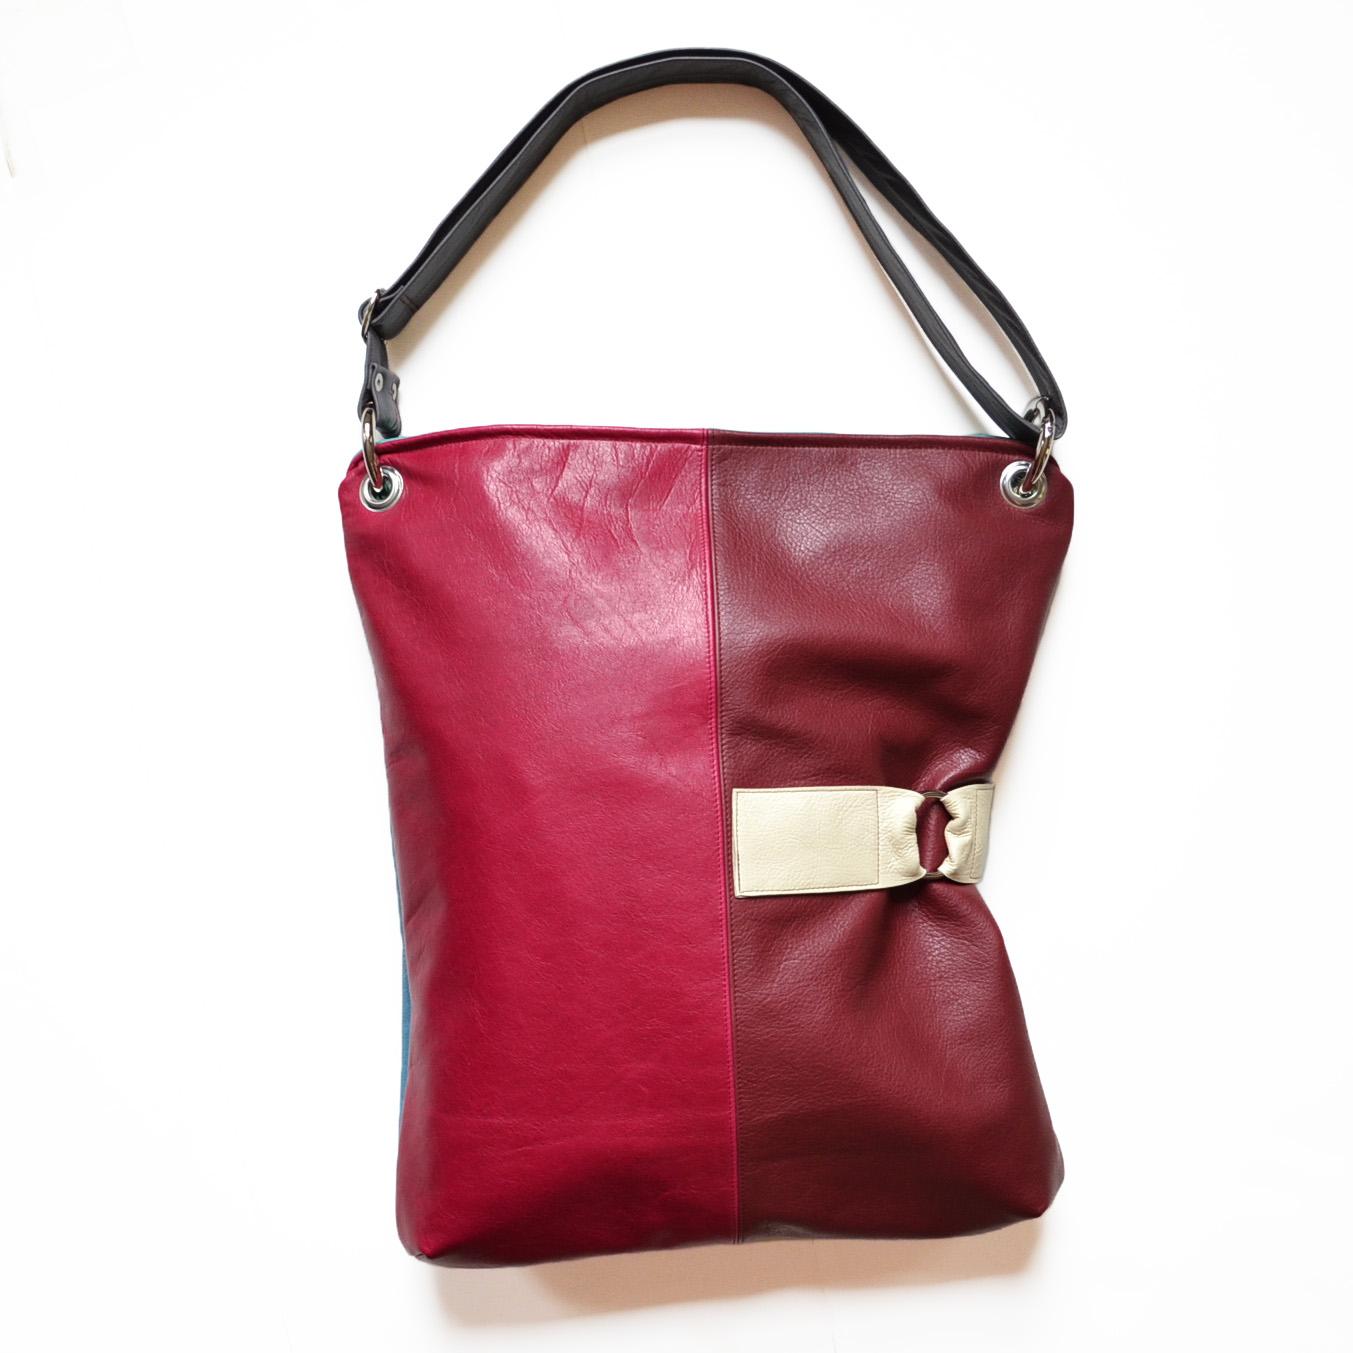 The Luella Crossbody Laptop Bag